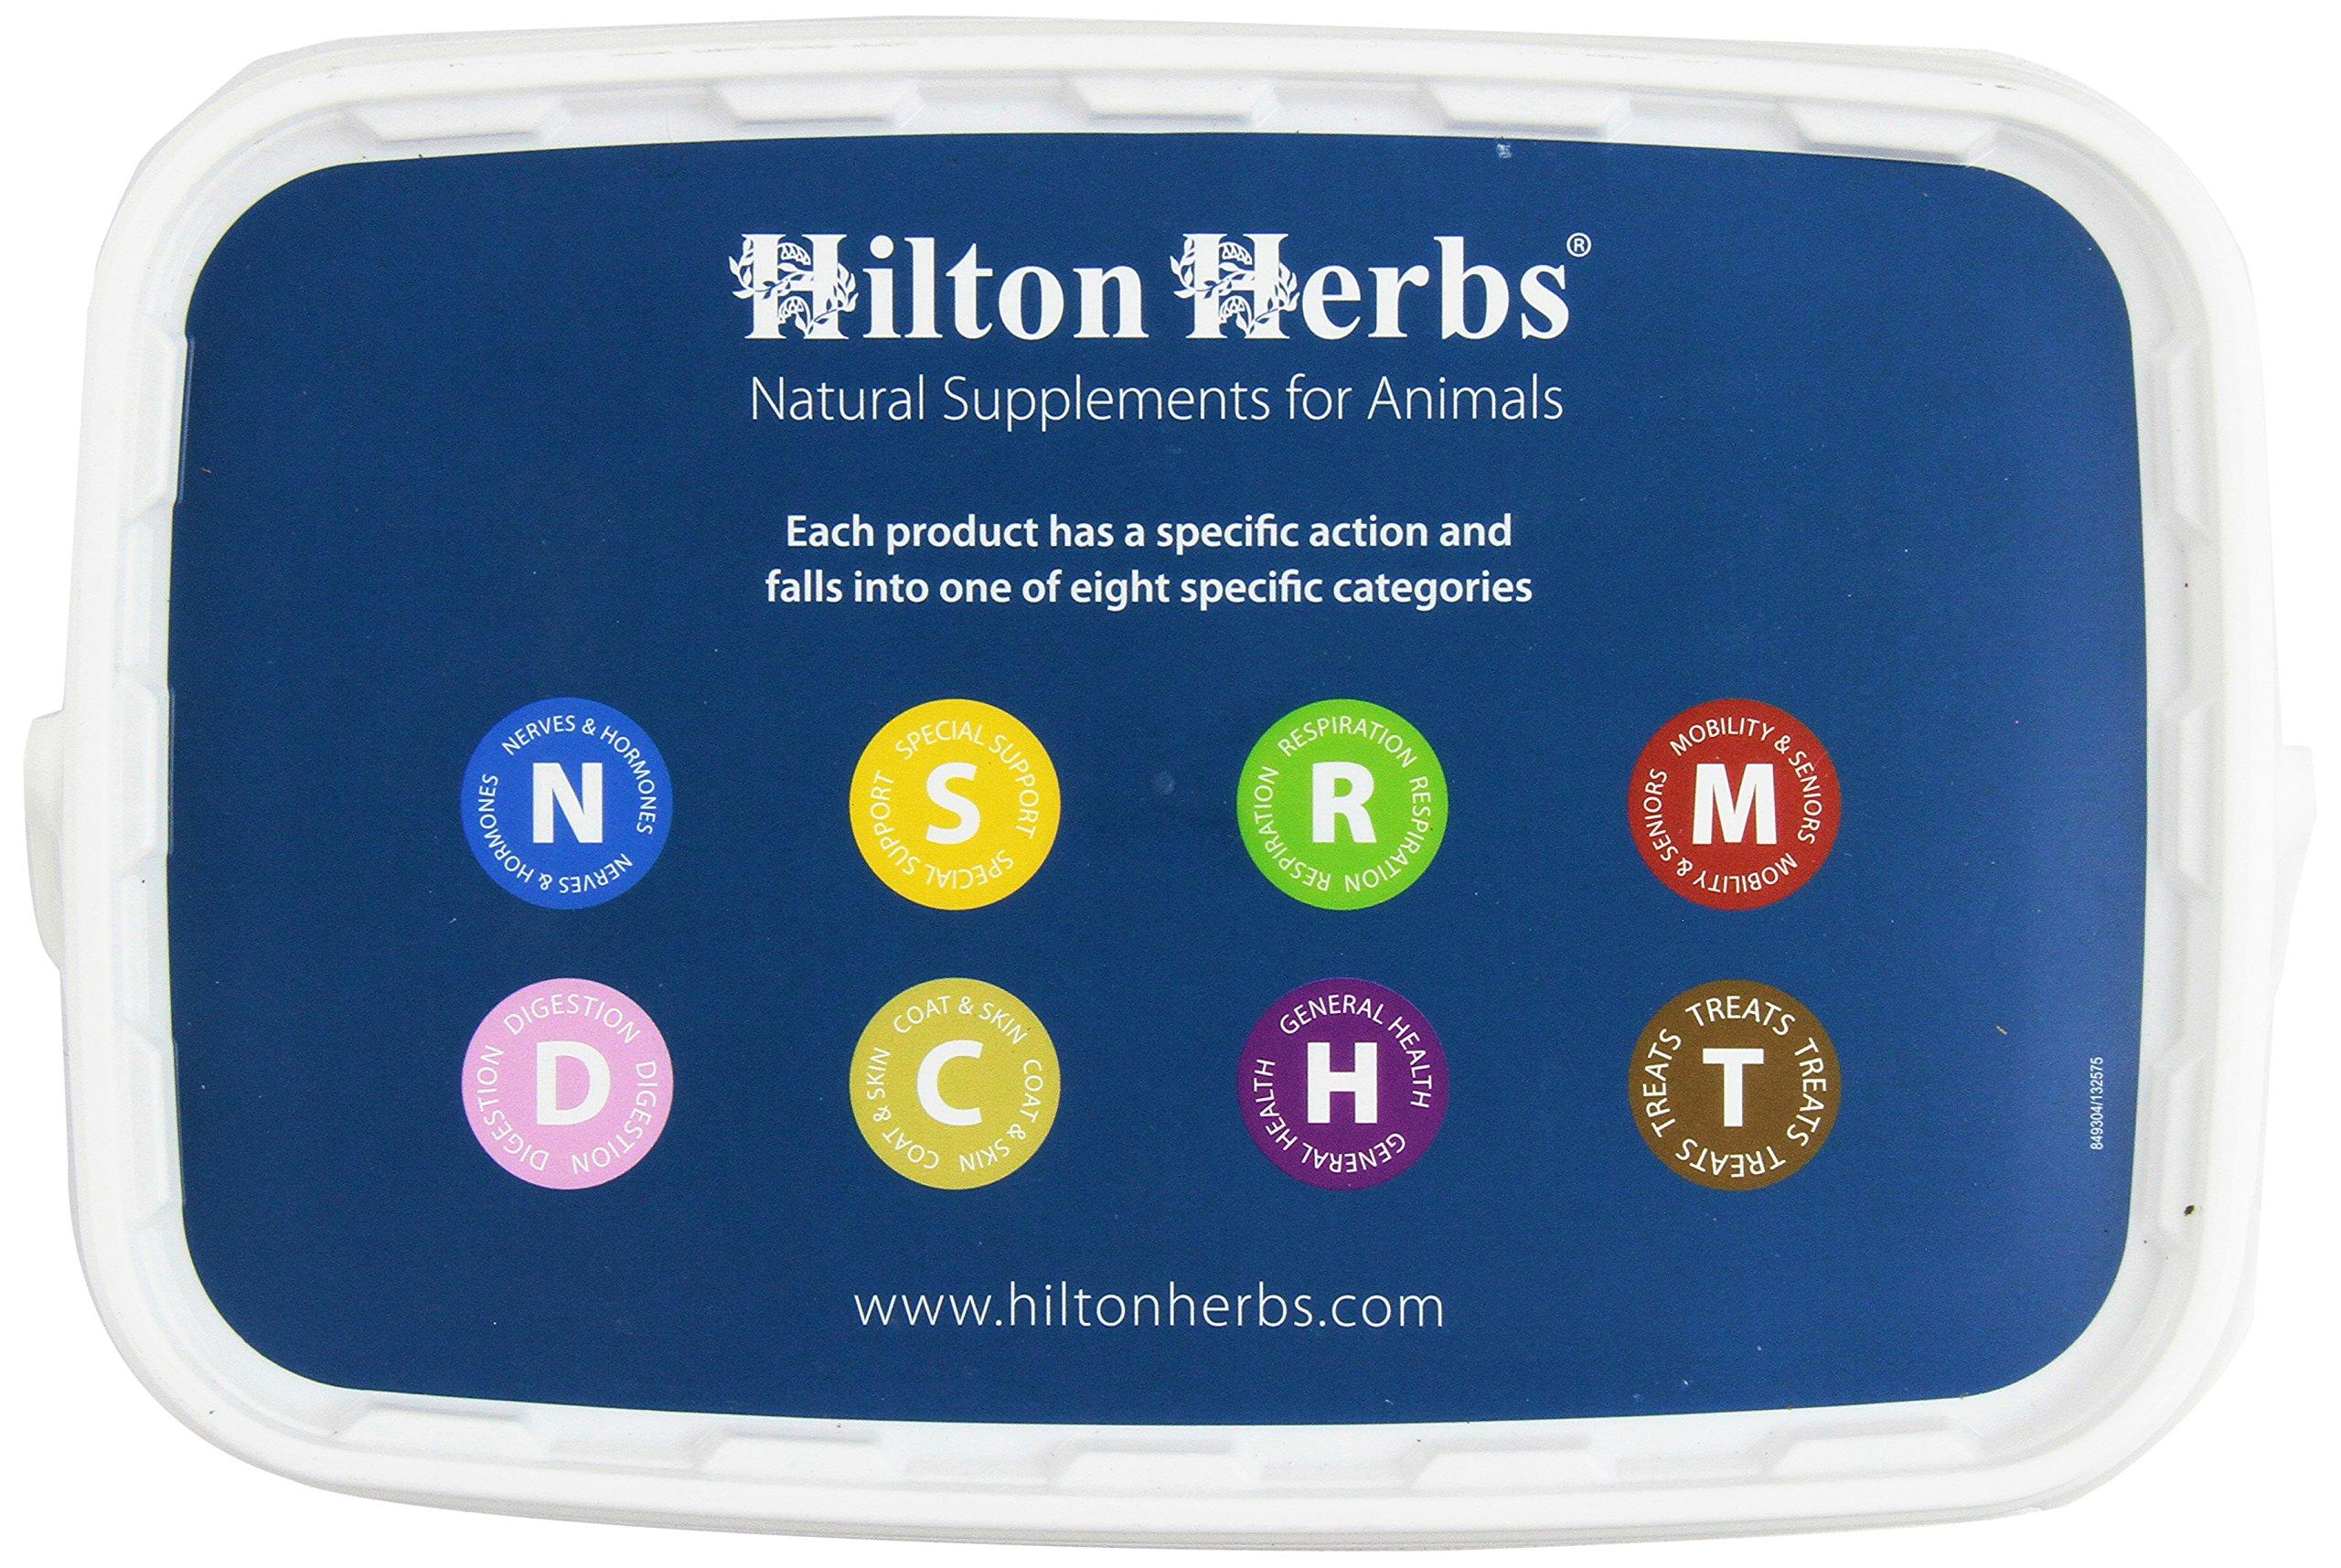 Hilton Herbs Vitex Plus Herbal Cushing's Support Supplement for Horses, 1kg Tub